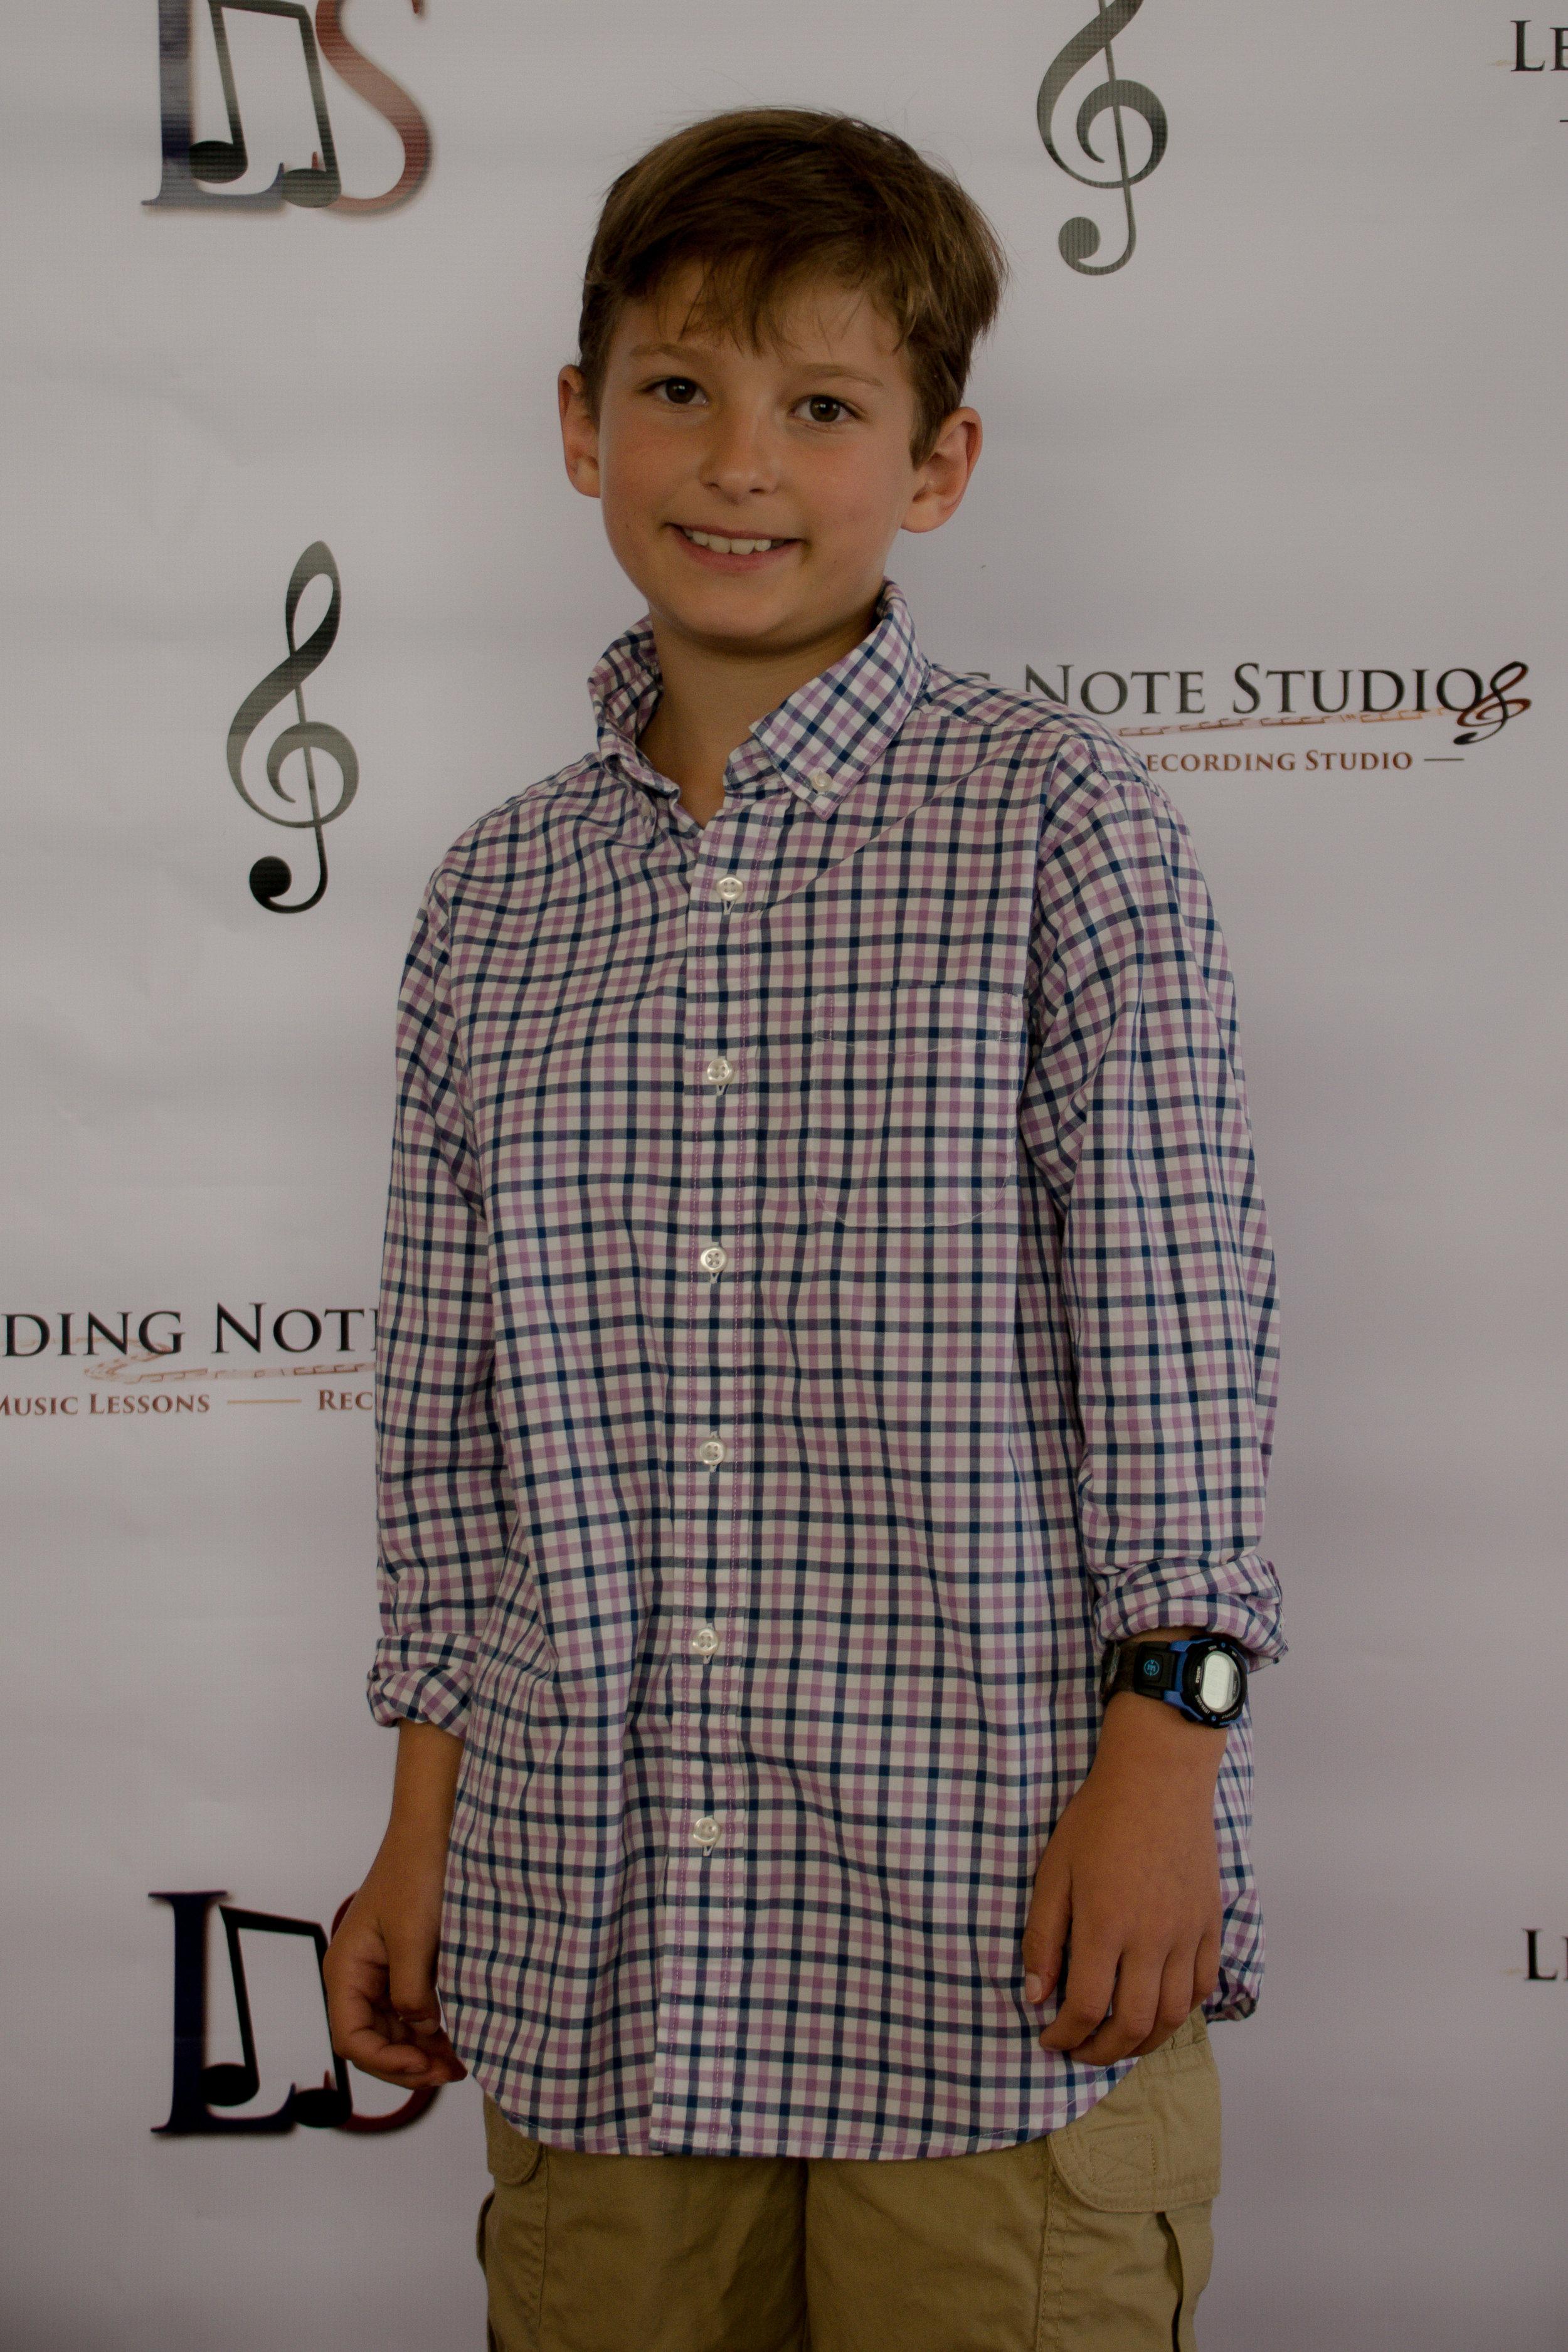 Brody Sergott